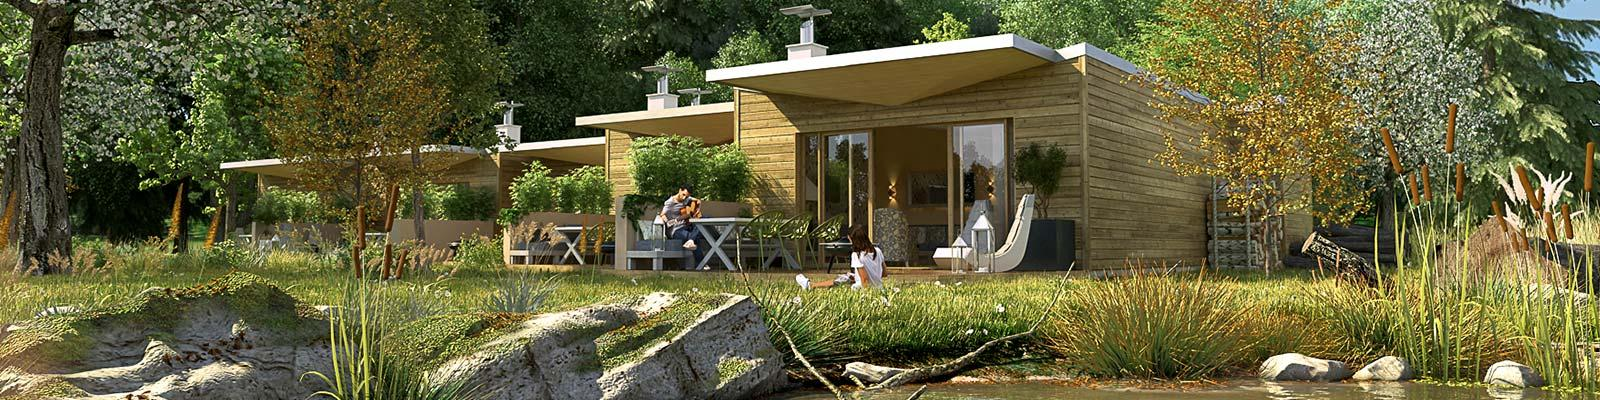 Villages Nature Corporate